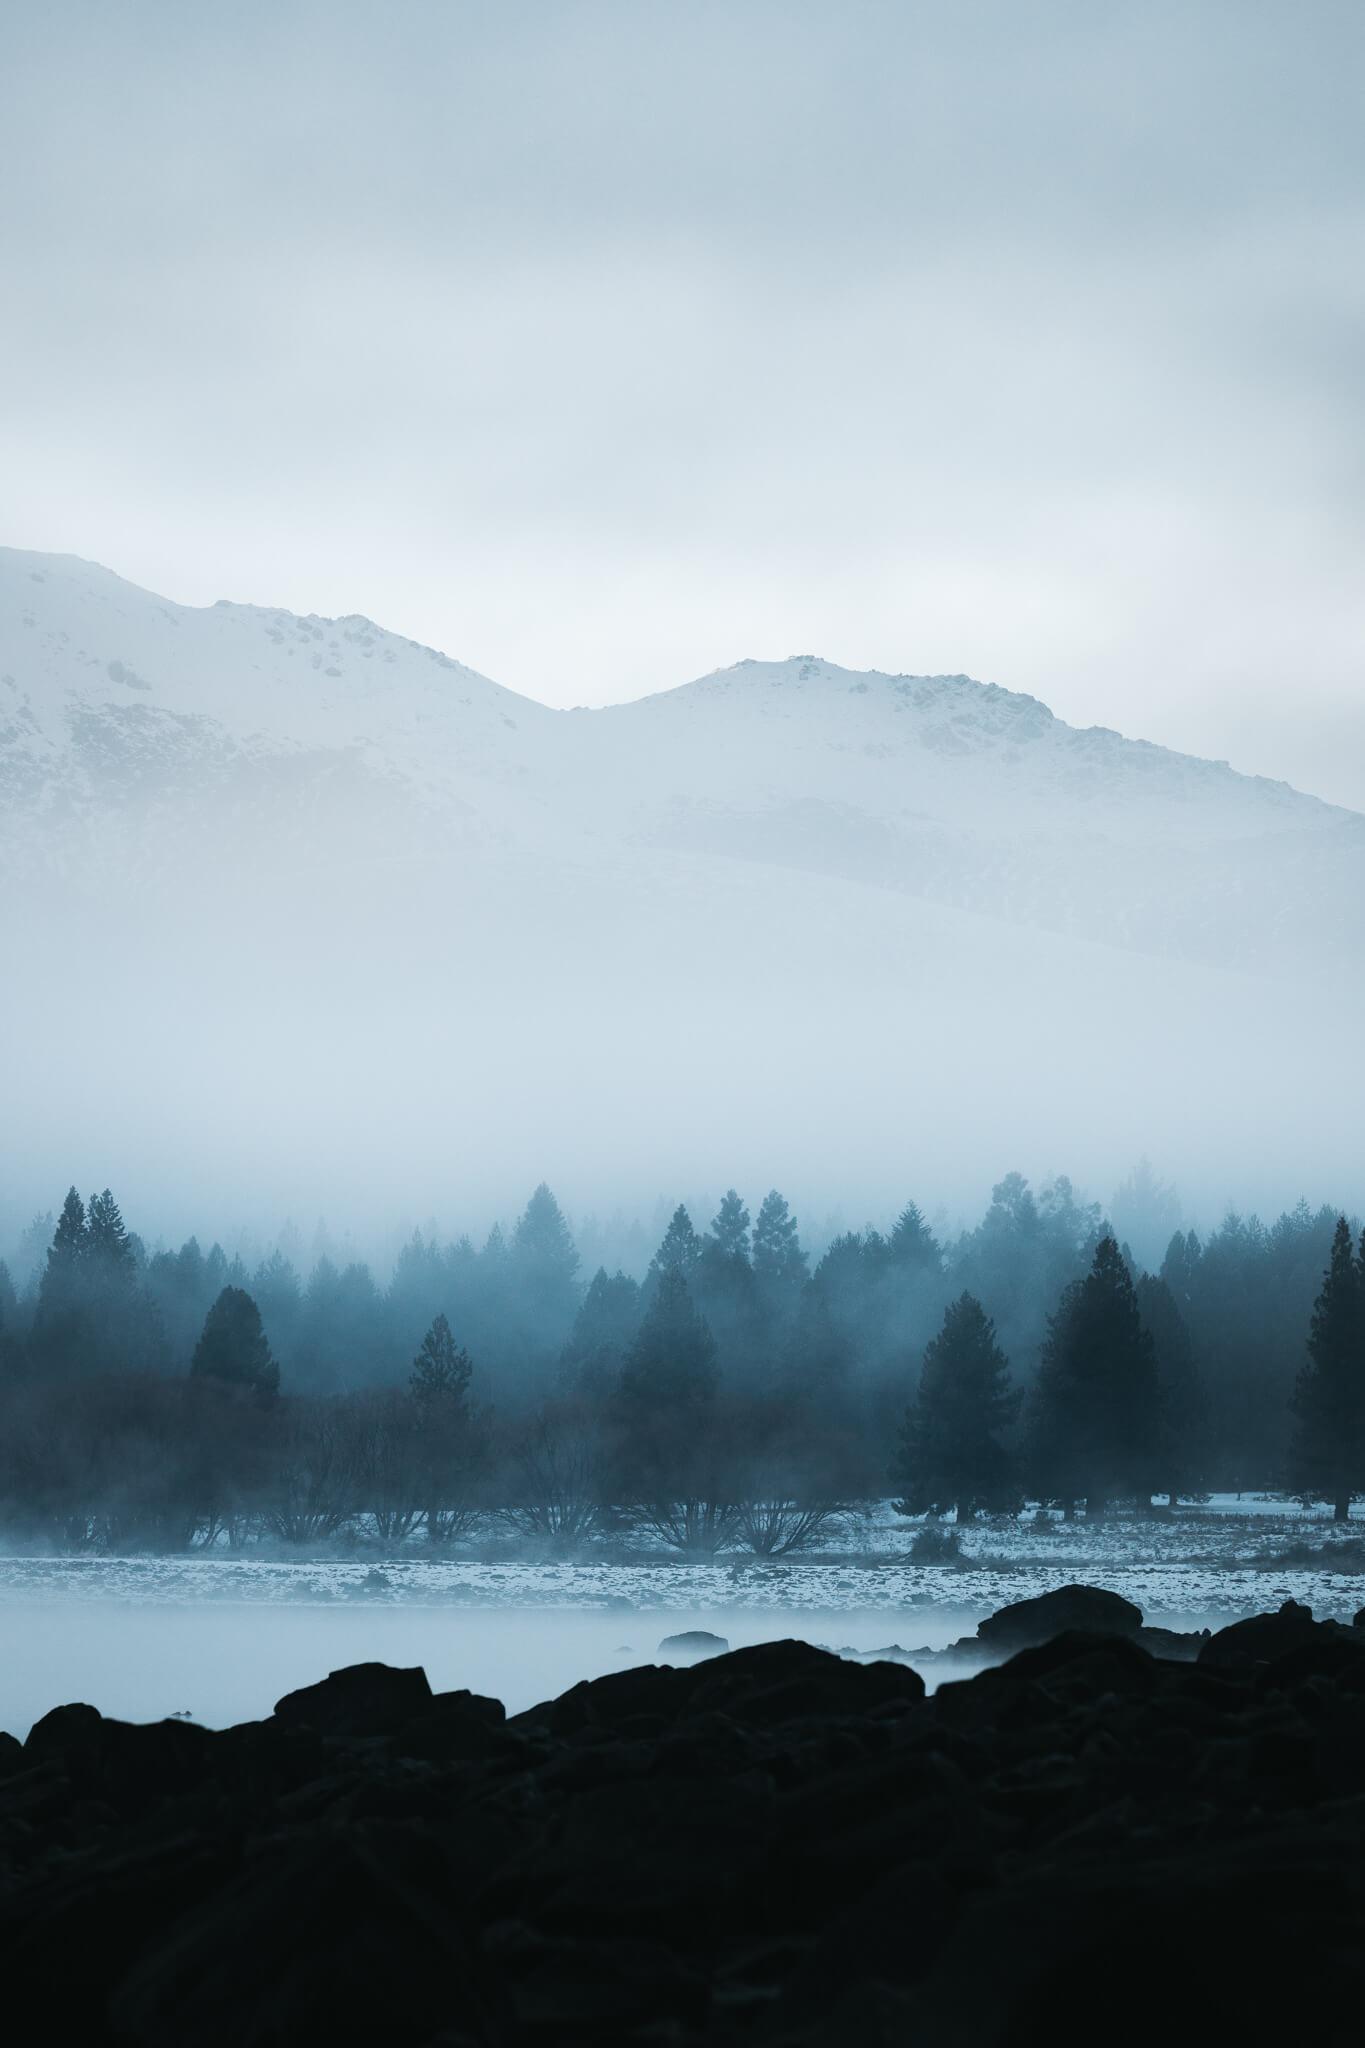 New-Zealand-Travel-Photography-Natalie-Skoric-19.jpg